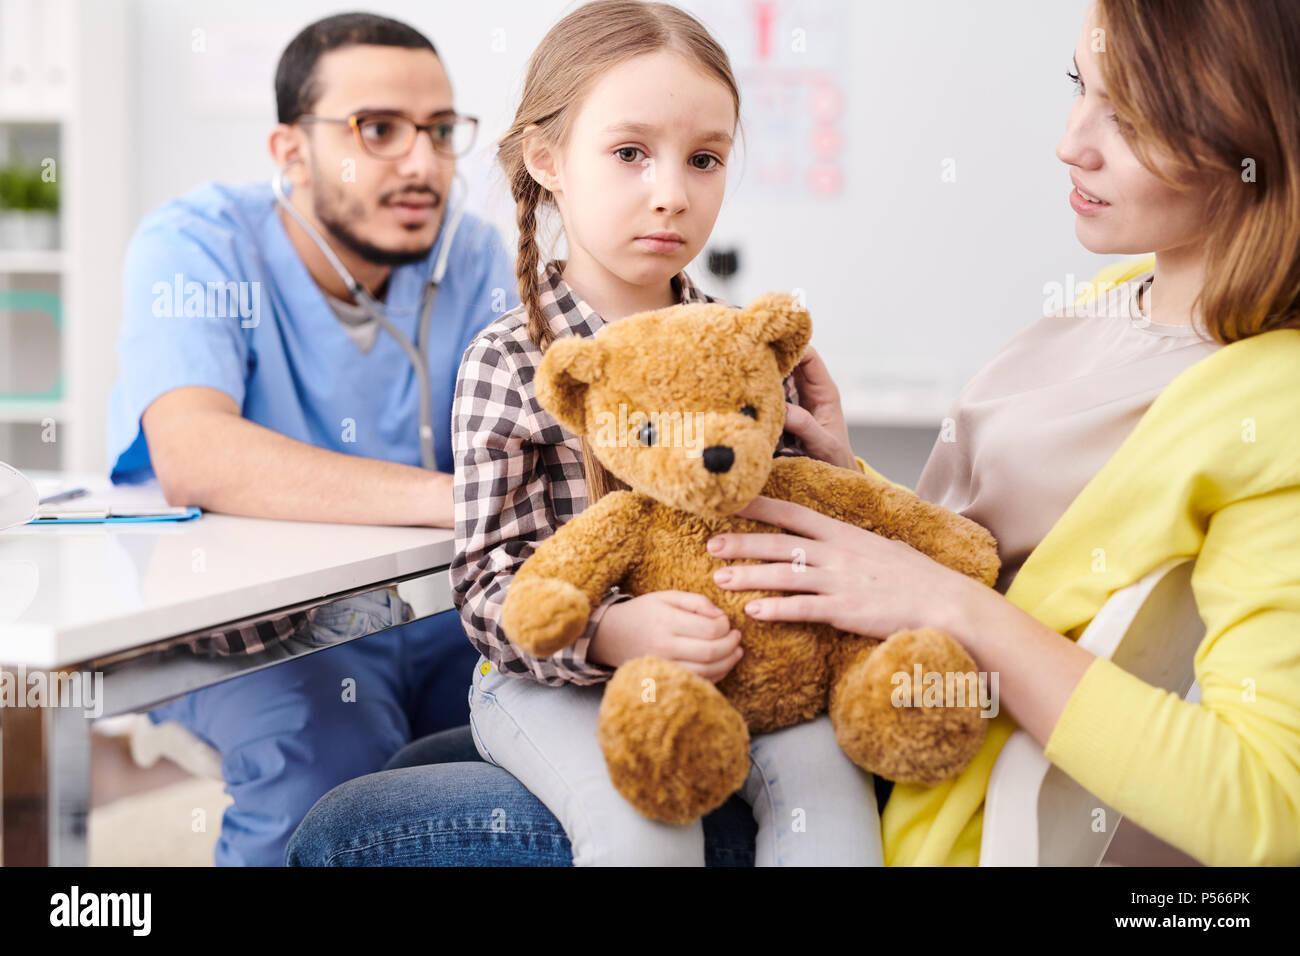 Pediatrician Examining Little Girl - Stock Image